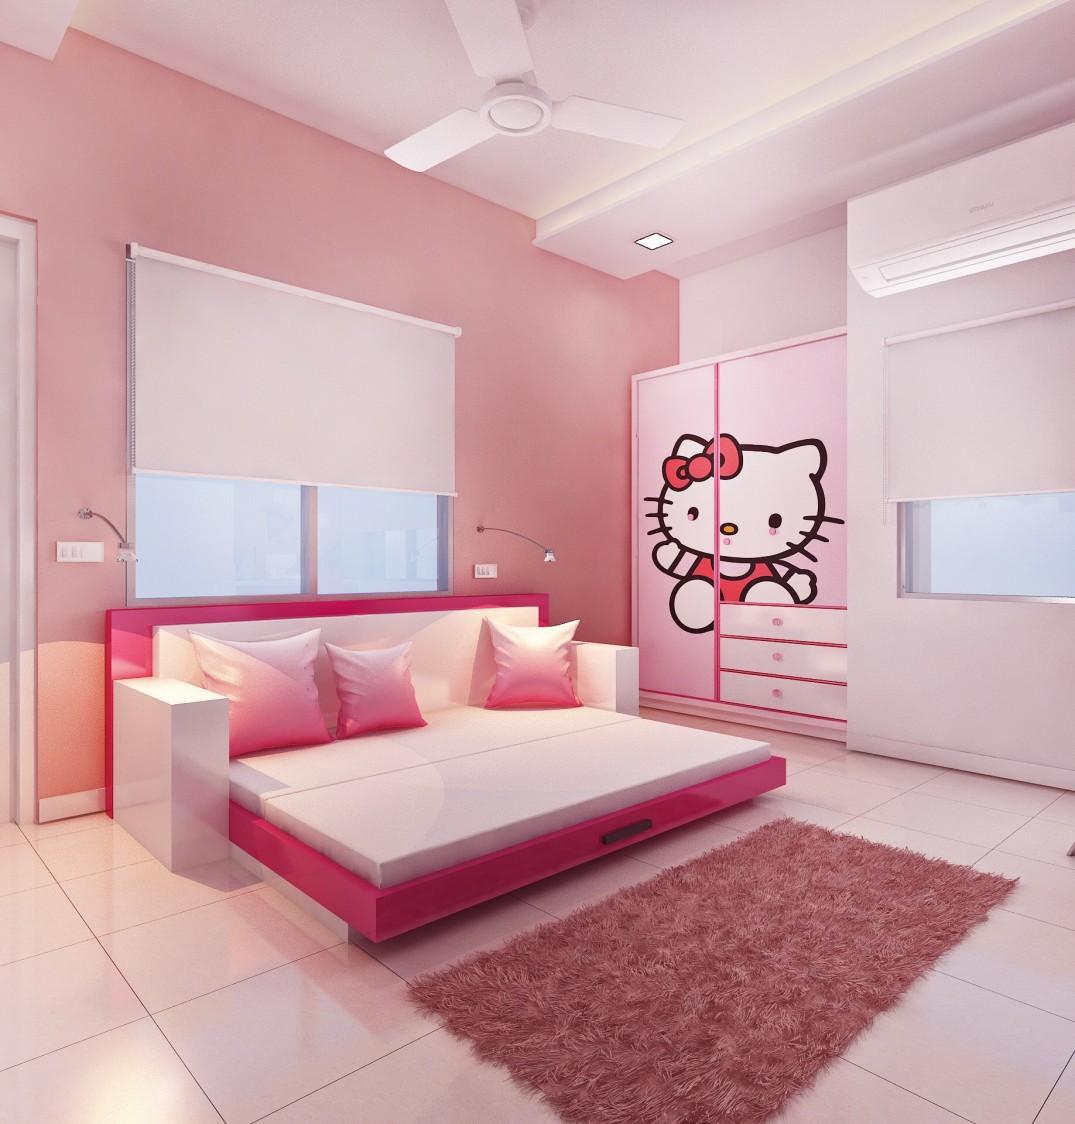 Pink Bedroom Design For Girls by setu.patel Bedroom | Interior Design Photos & Ideas